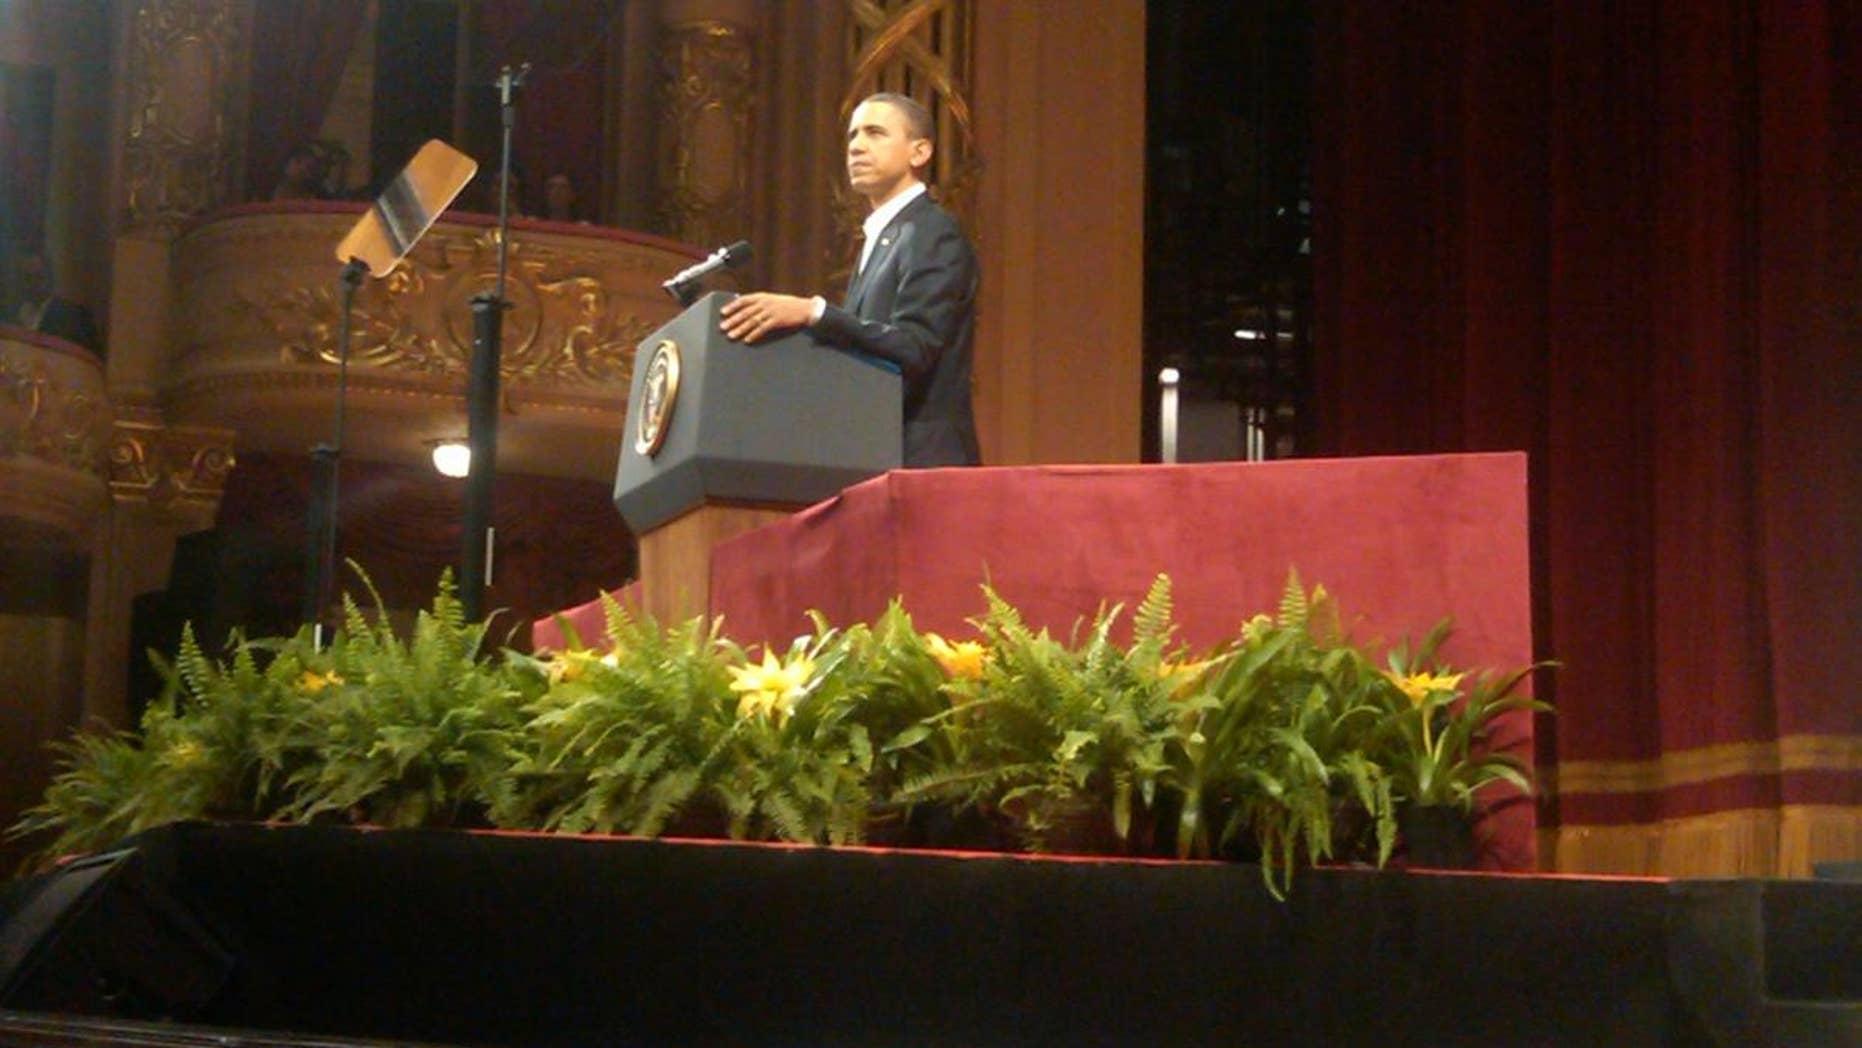 President Obama speaks at the Theatro Municipal in Rio de Janeiro/Fox News Photo